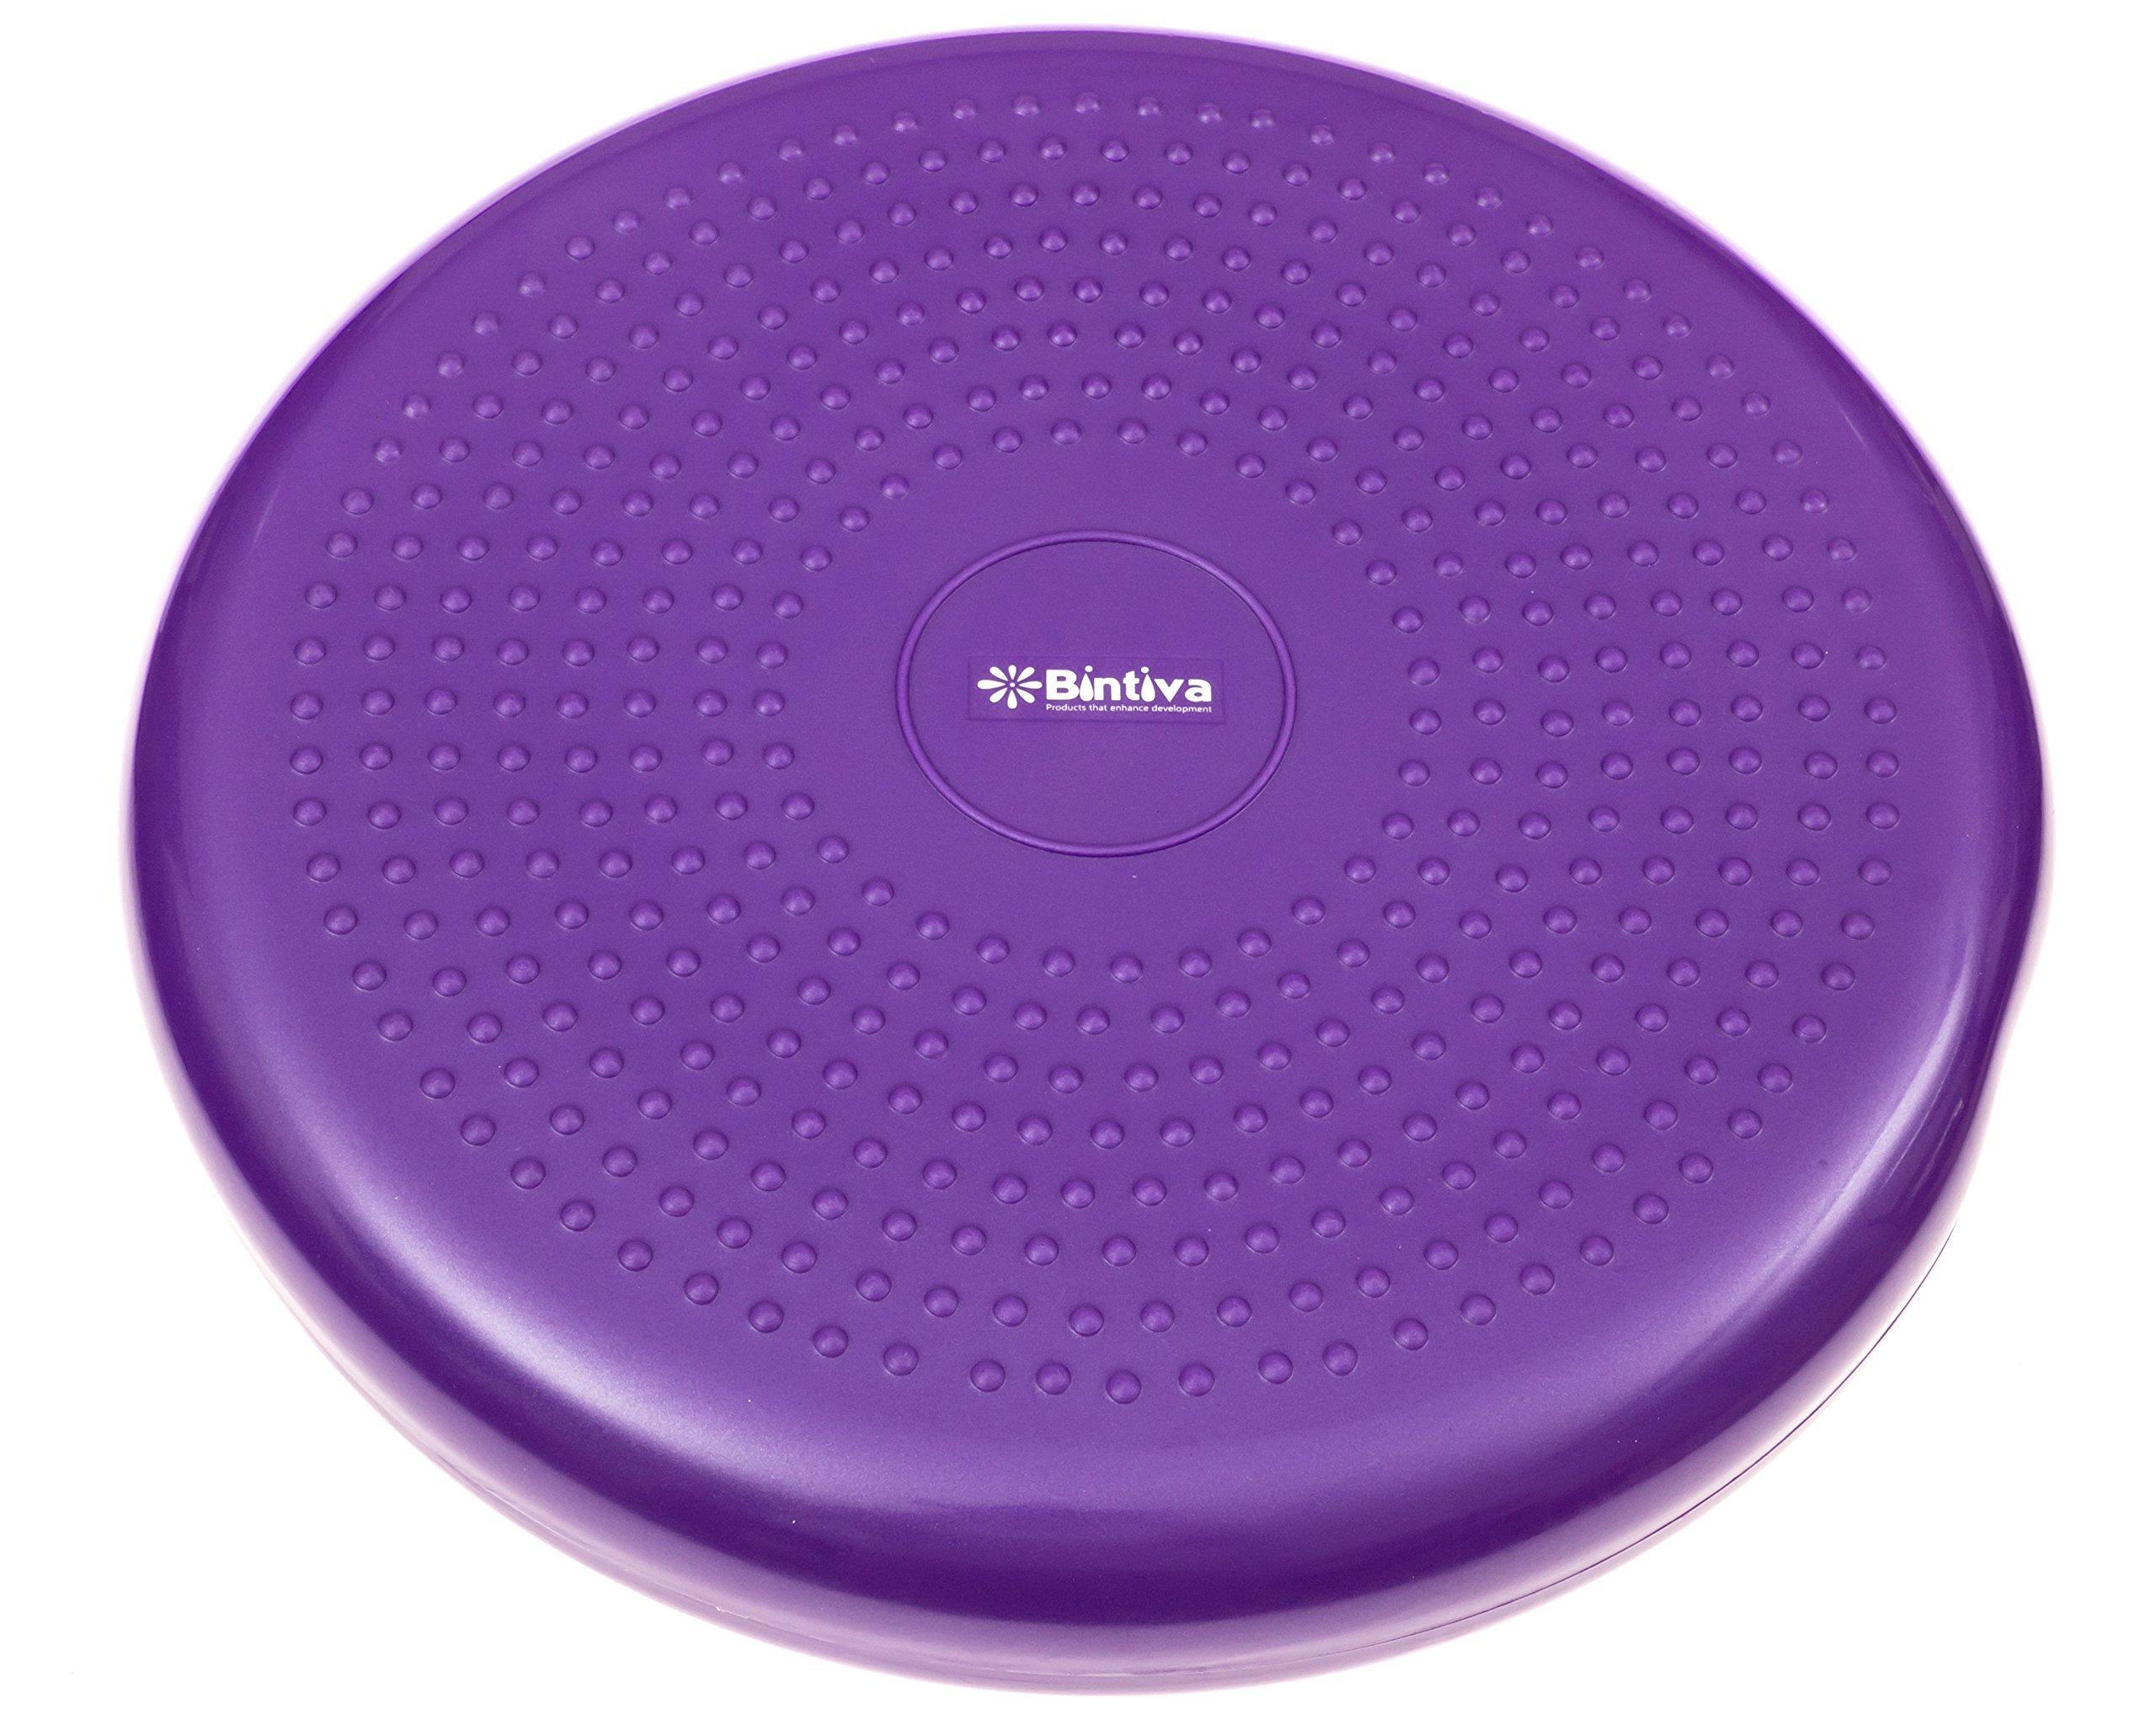 bintiva round balance disc purple 33cm by bintiva (Image #2)